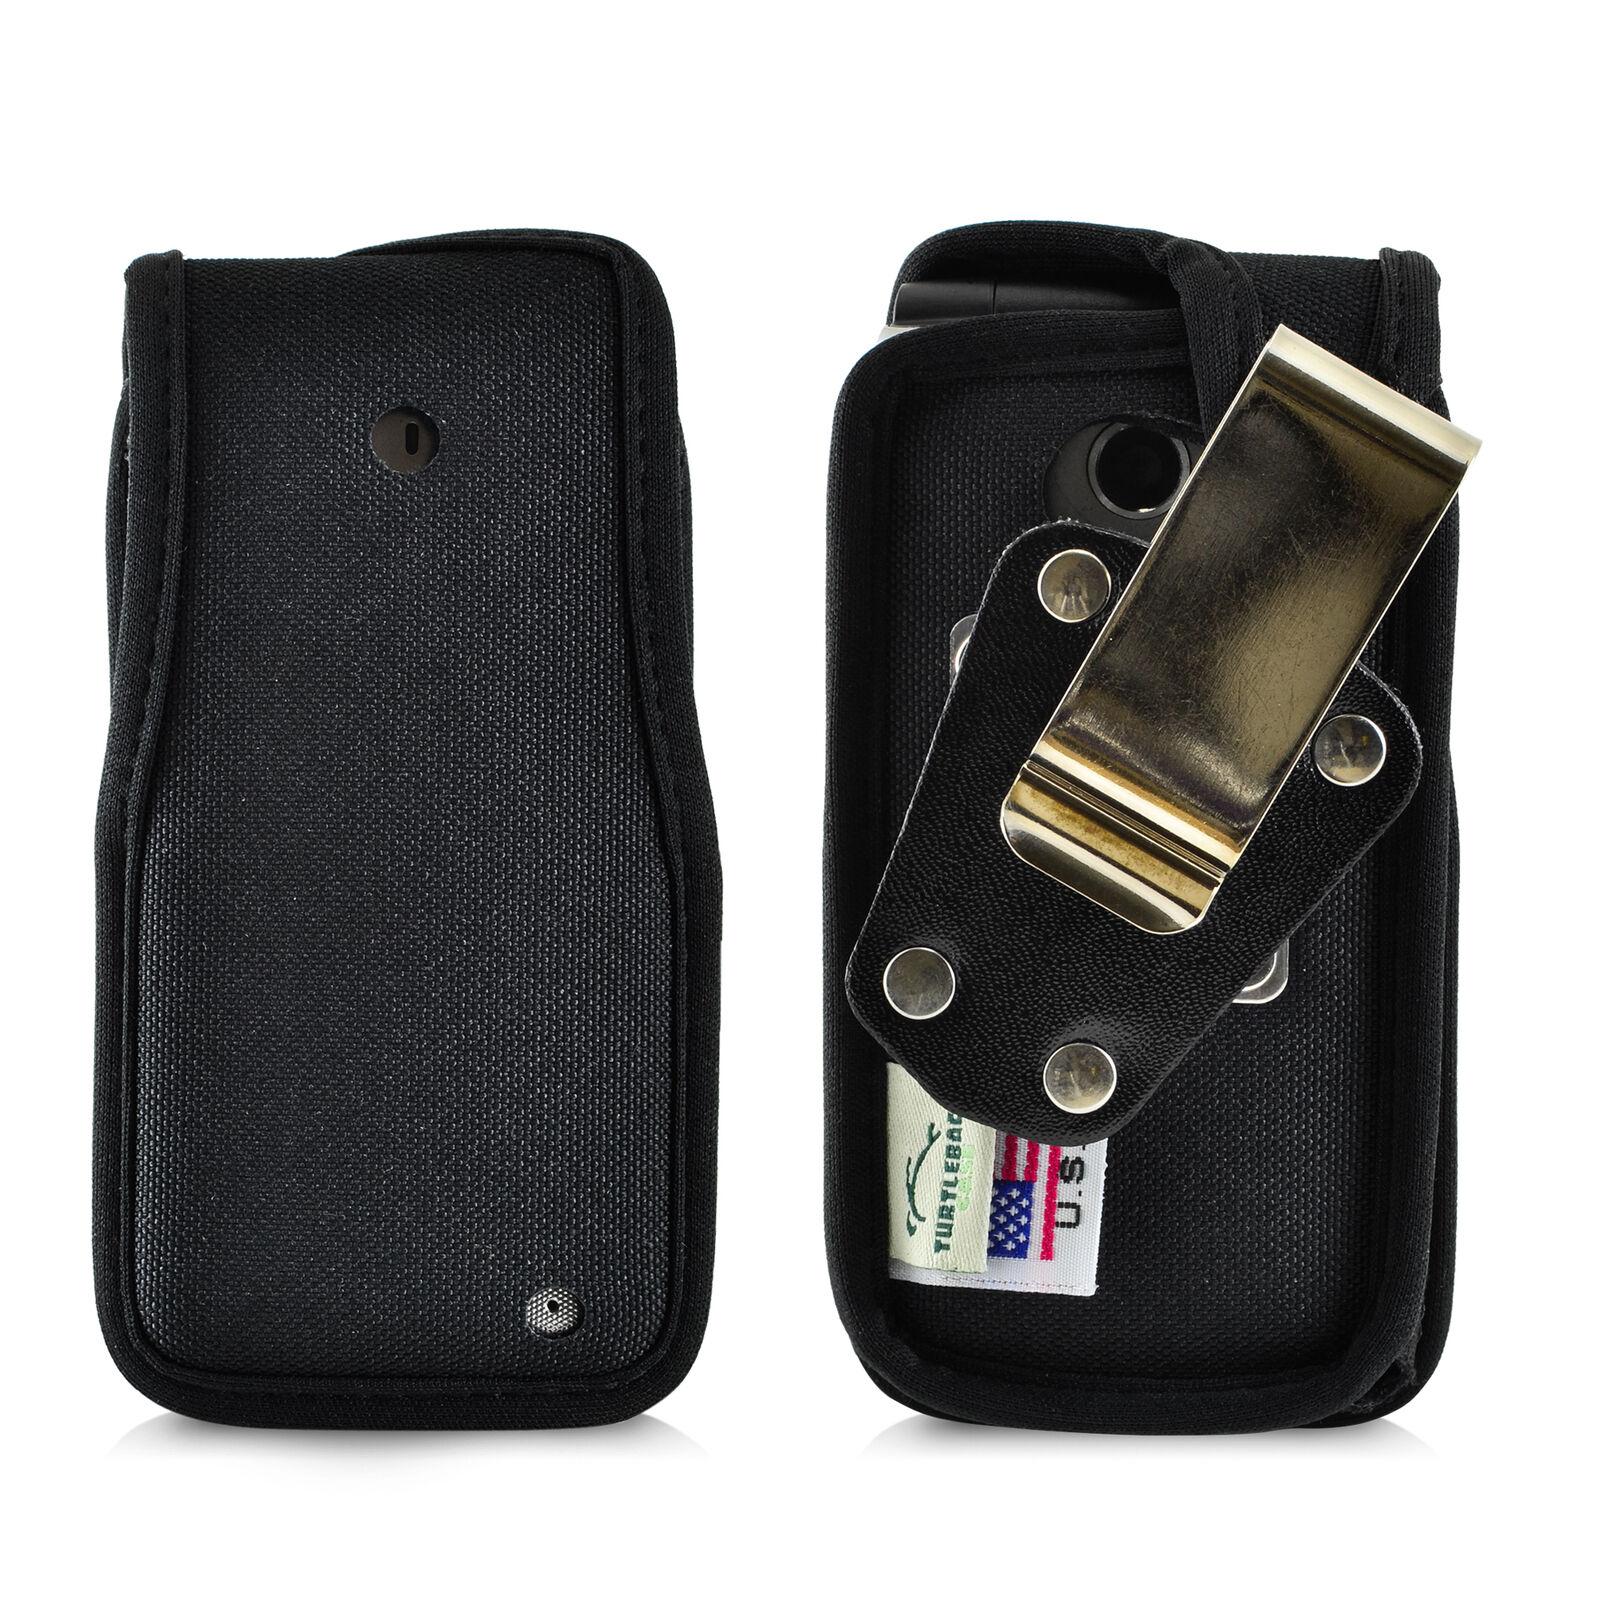 lg-exalt-lte-vn220-4g-black-nylon-case-with-removable-metal-belt-clip-usa-made